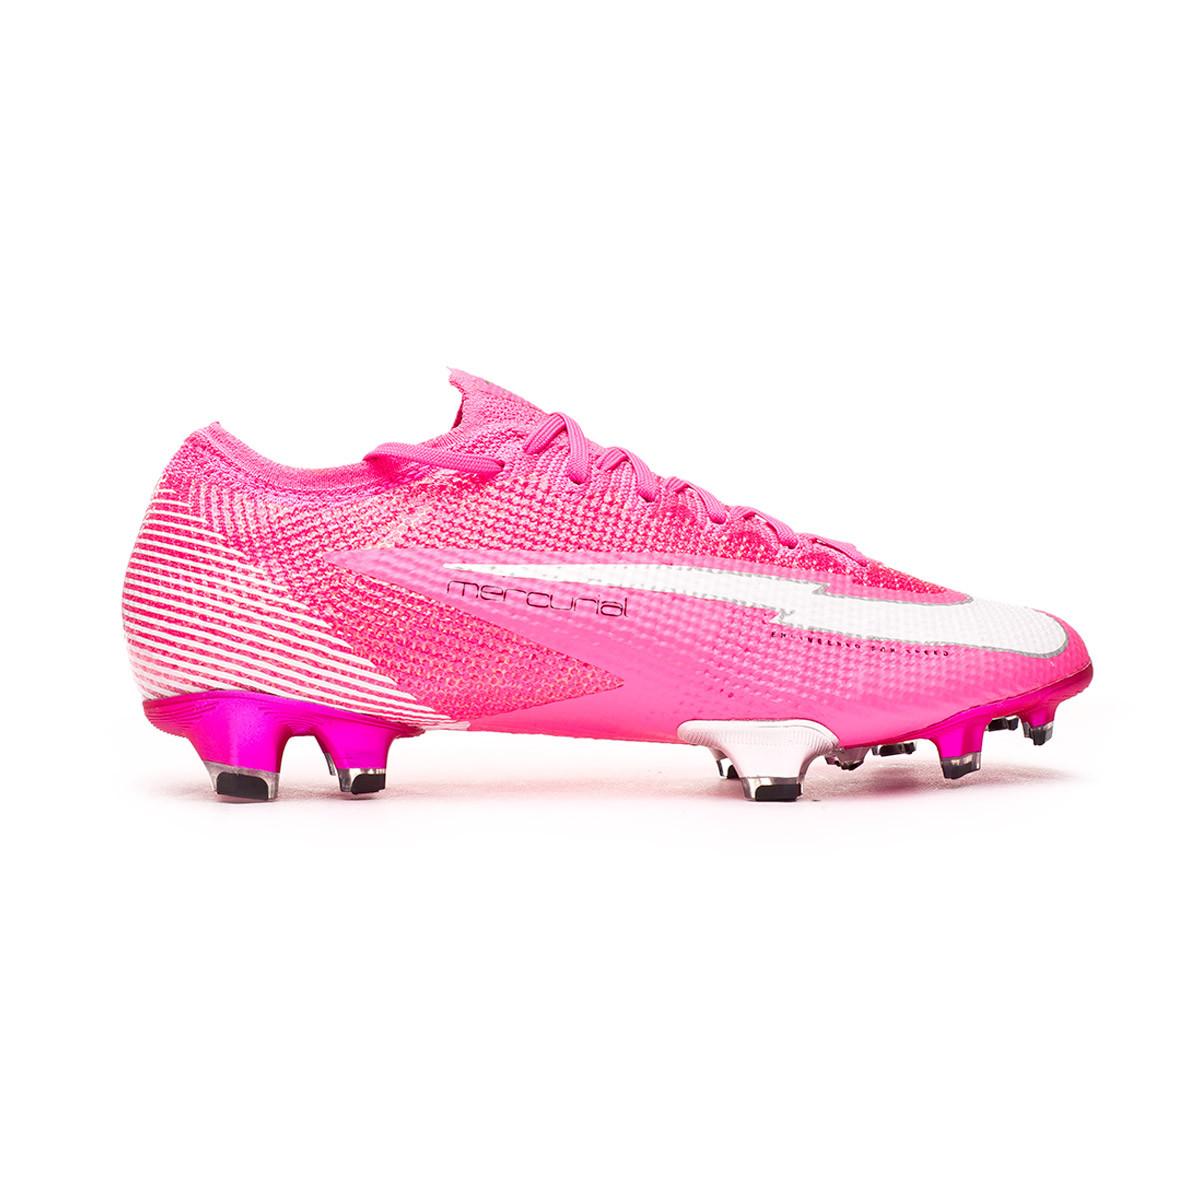 Football Boots Nike Mercurial Vapor